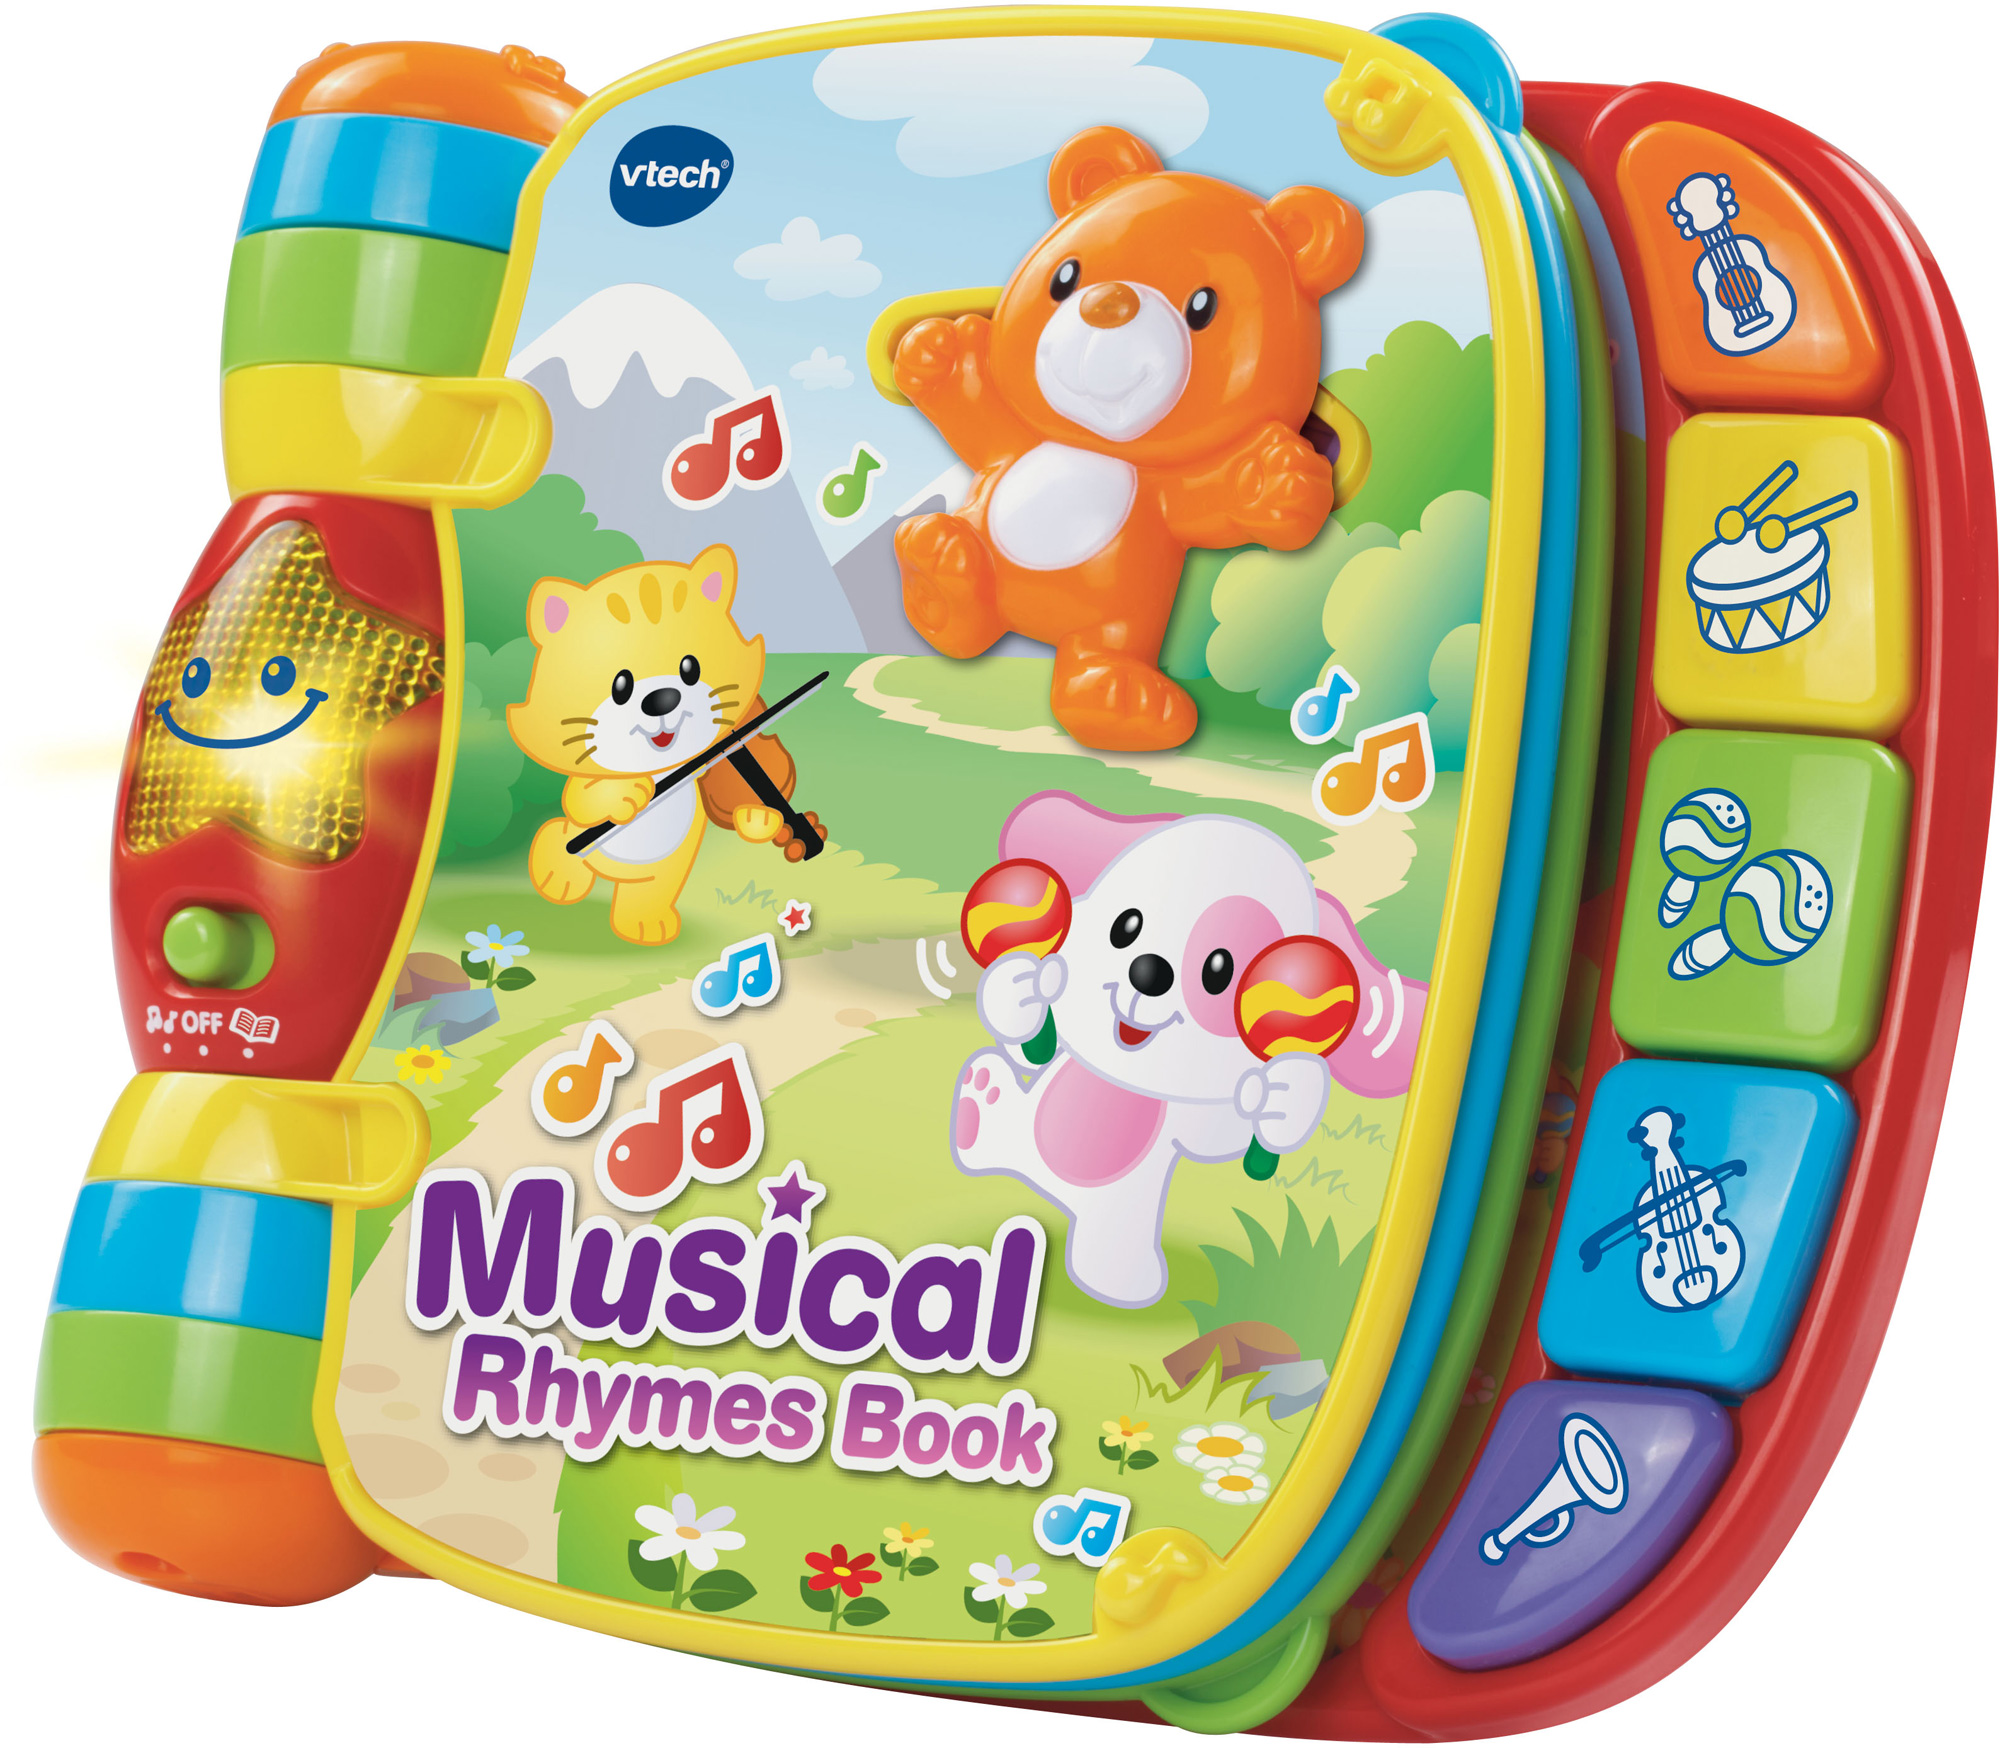 Vtech MUSICAL RHYMES BOOK Baby/Toddler Nursery Rhymes ...